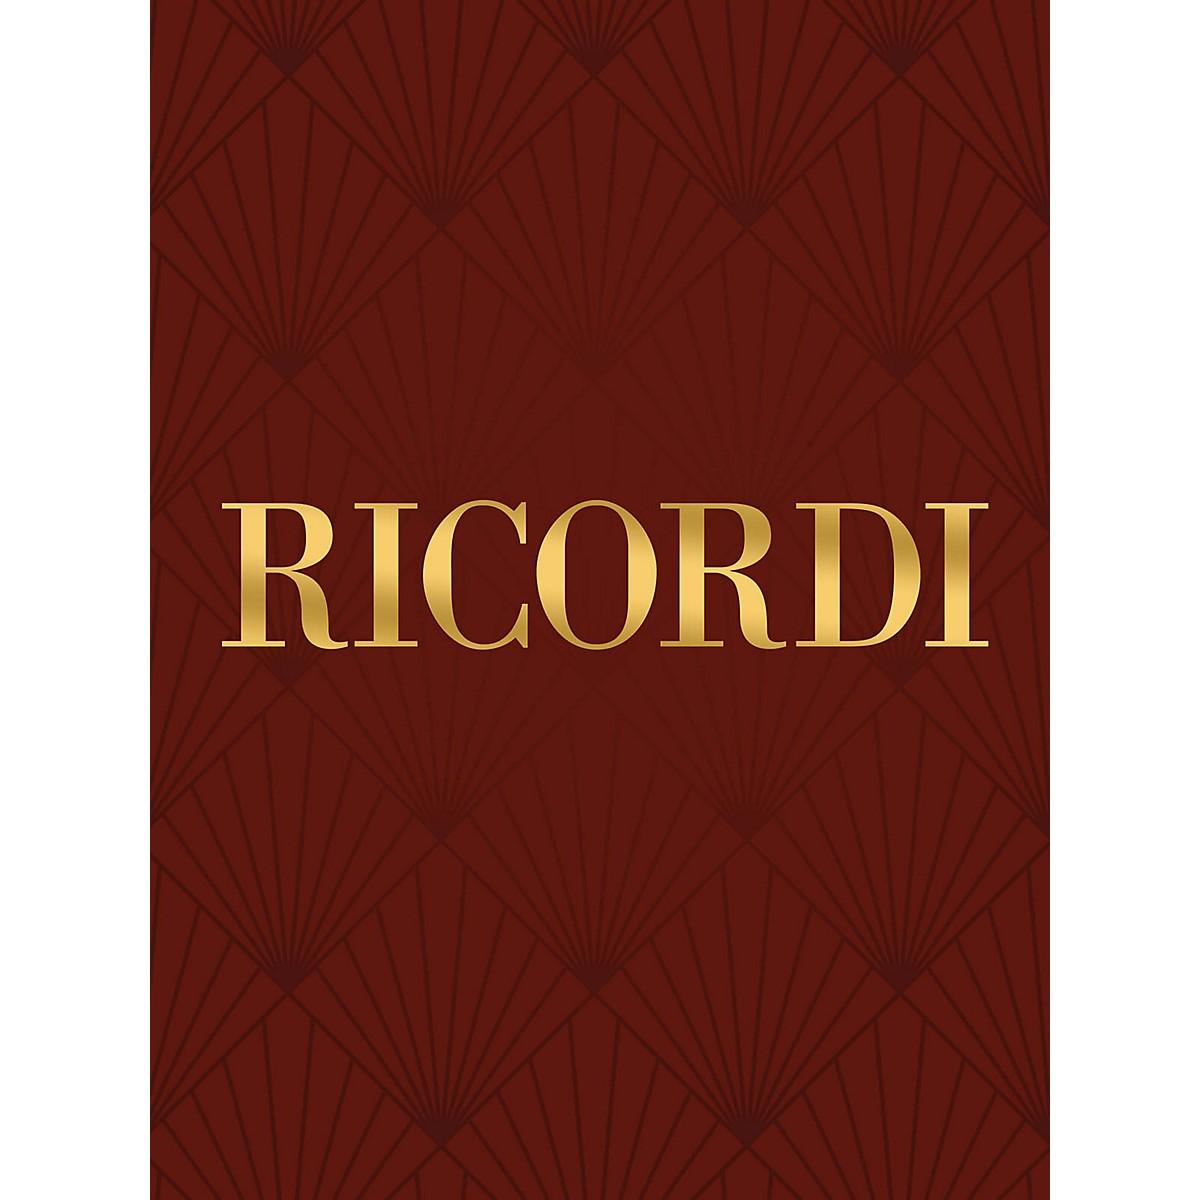 Ricordi Double Take 5 Guitar Duets For 2 Guitars Ricordi London Series